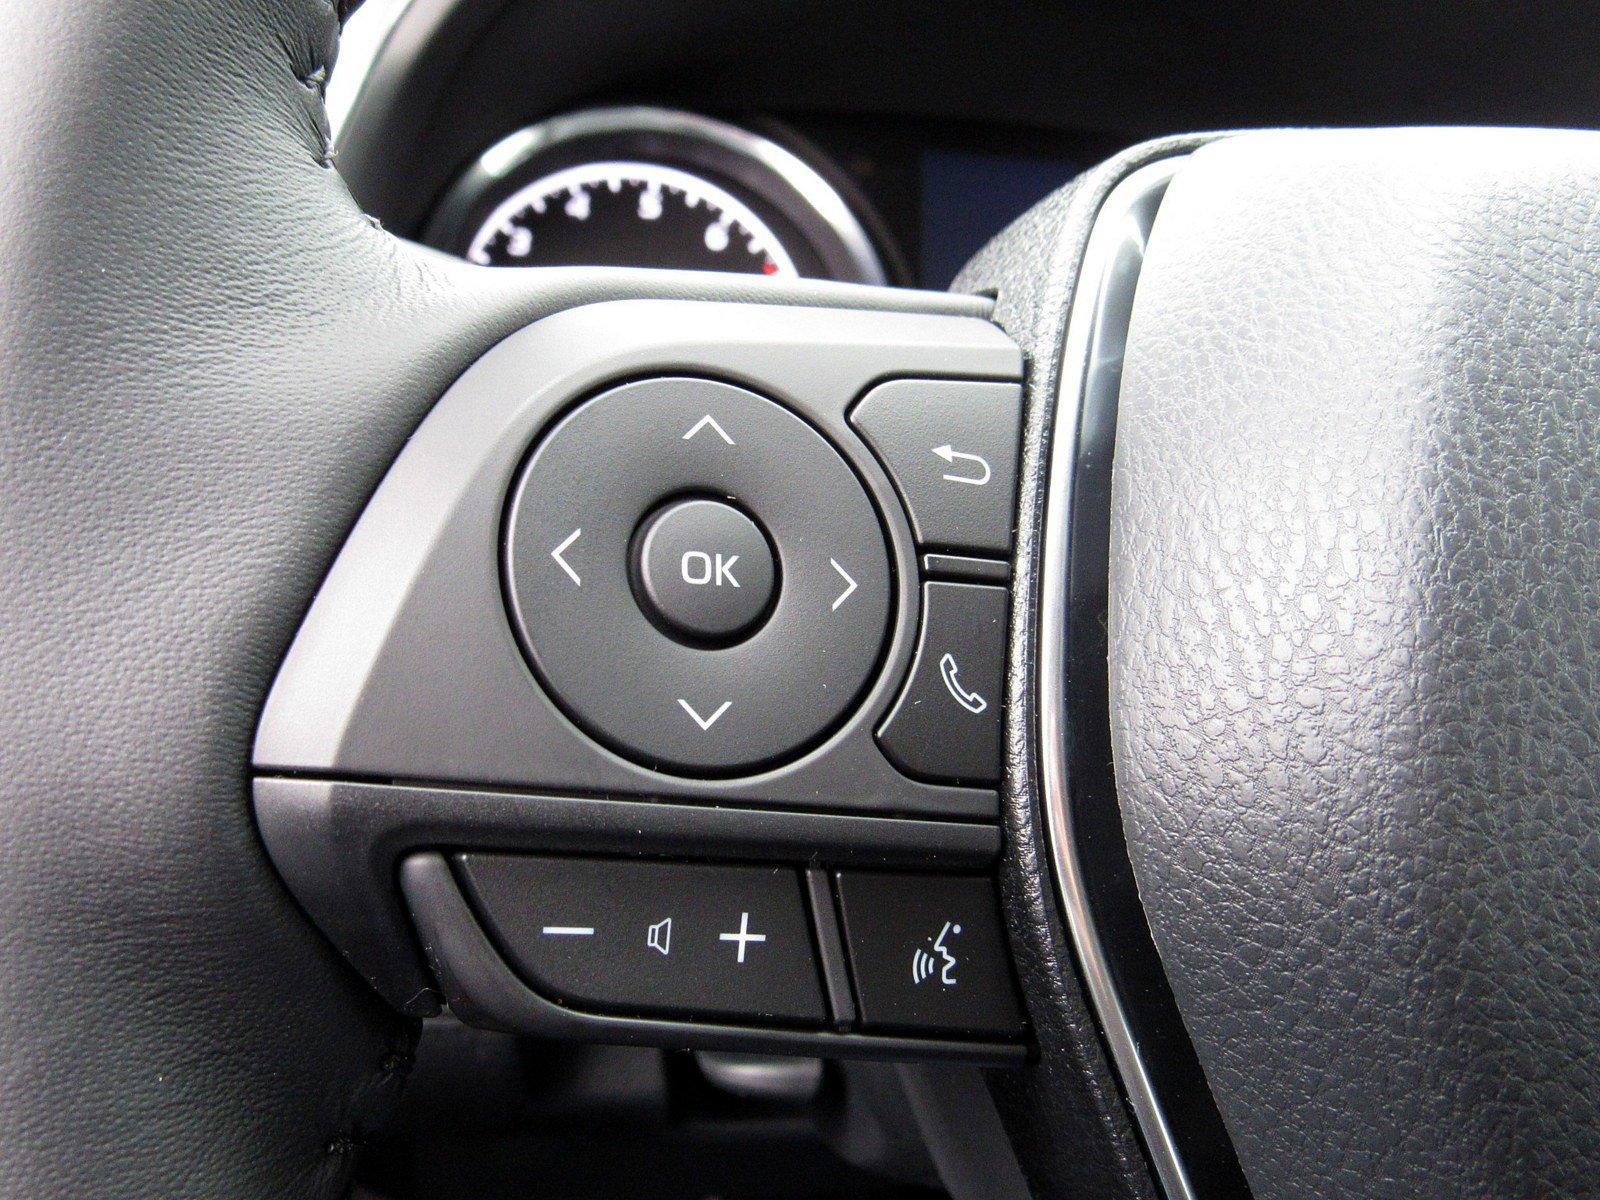 New 2020 Toyota Camry SE Nightshade